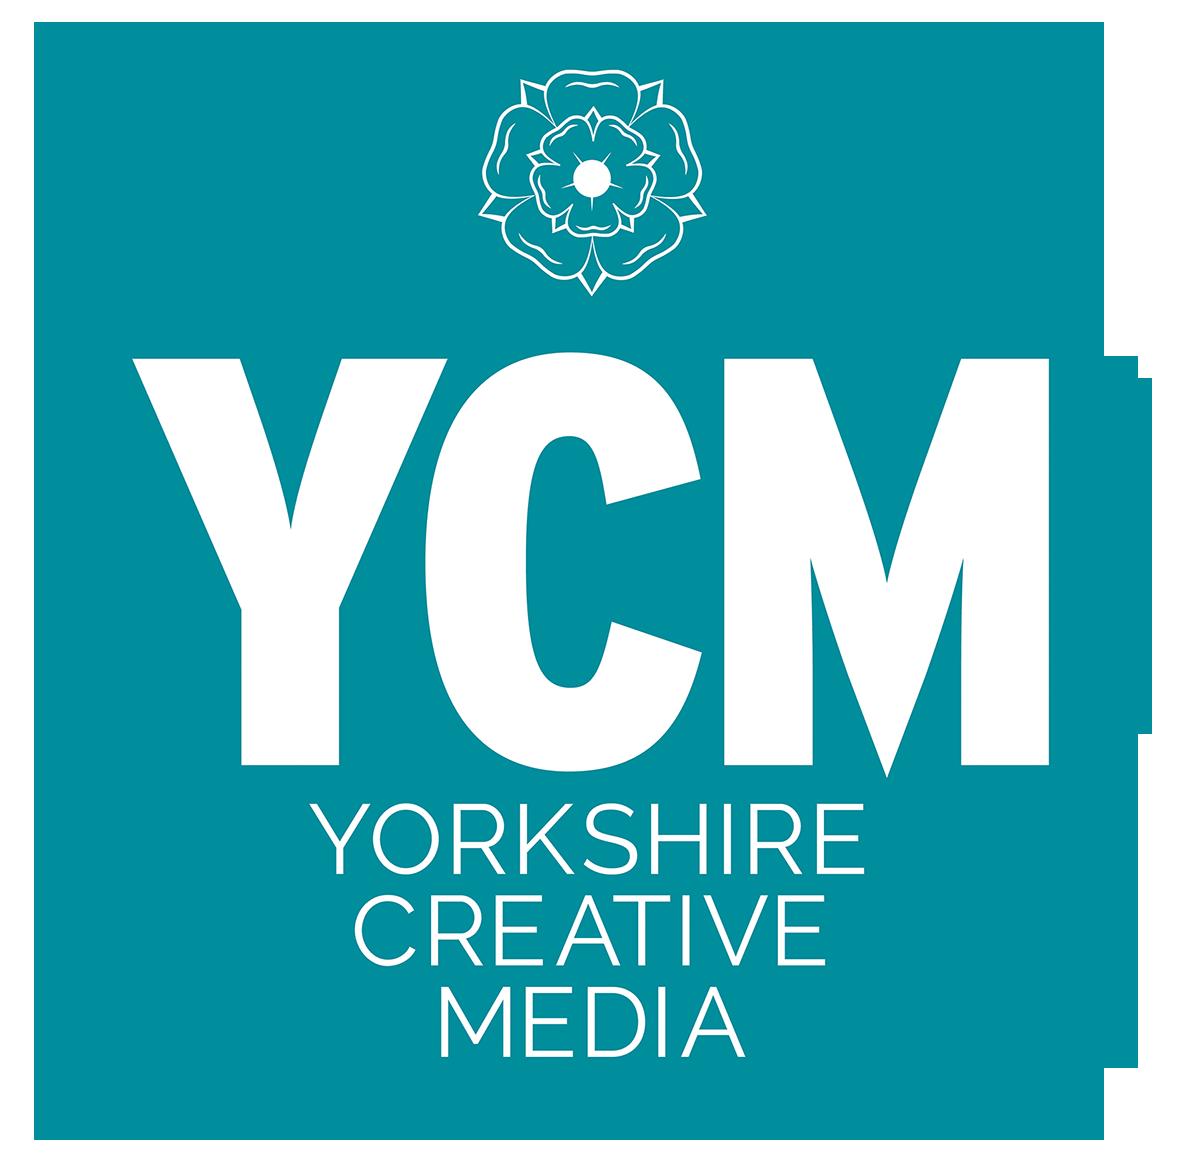 Yorkshire Creative Media